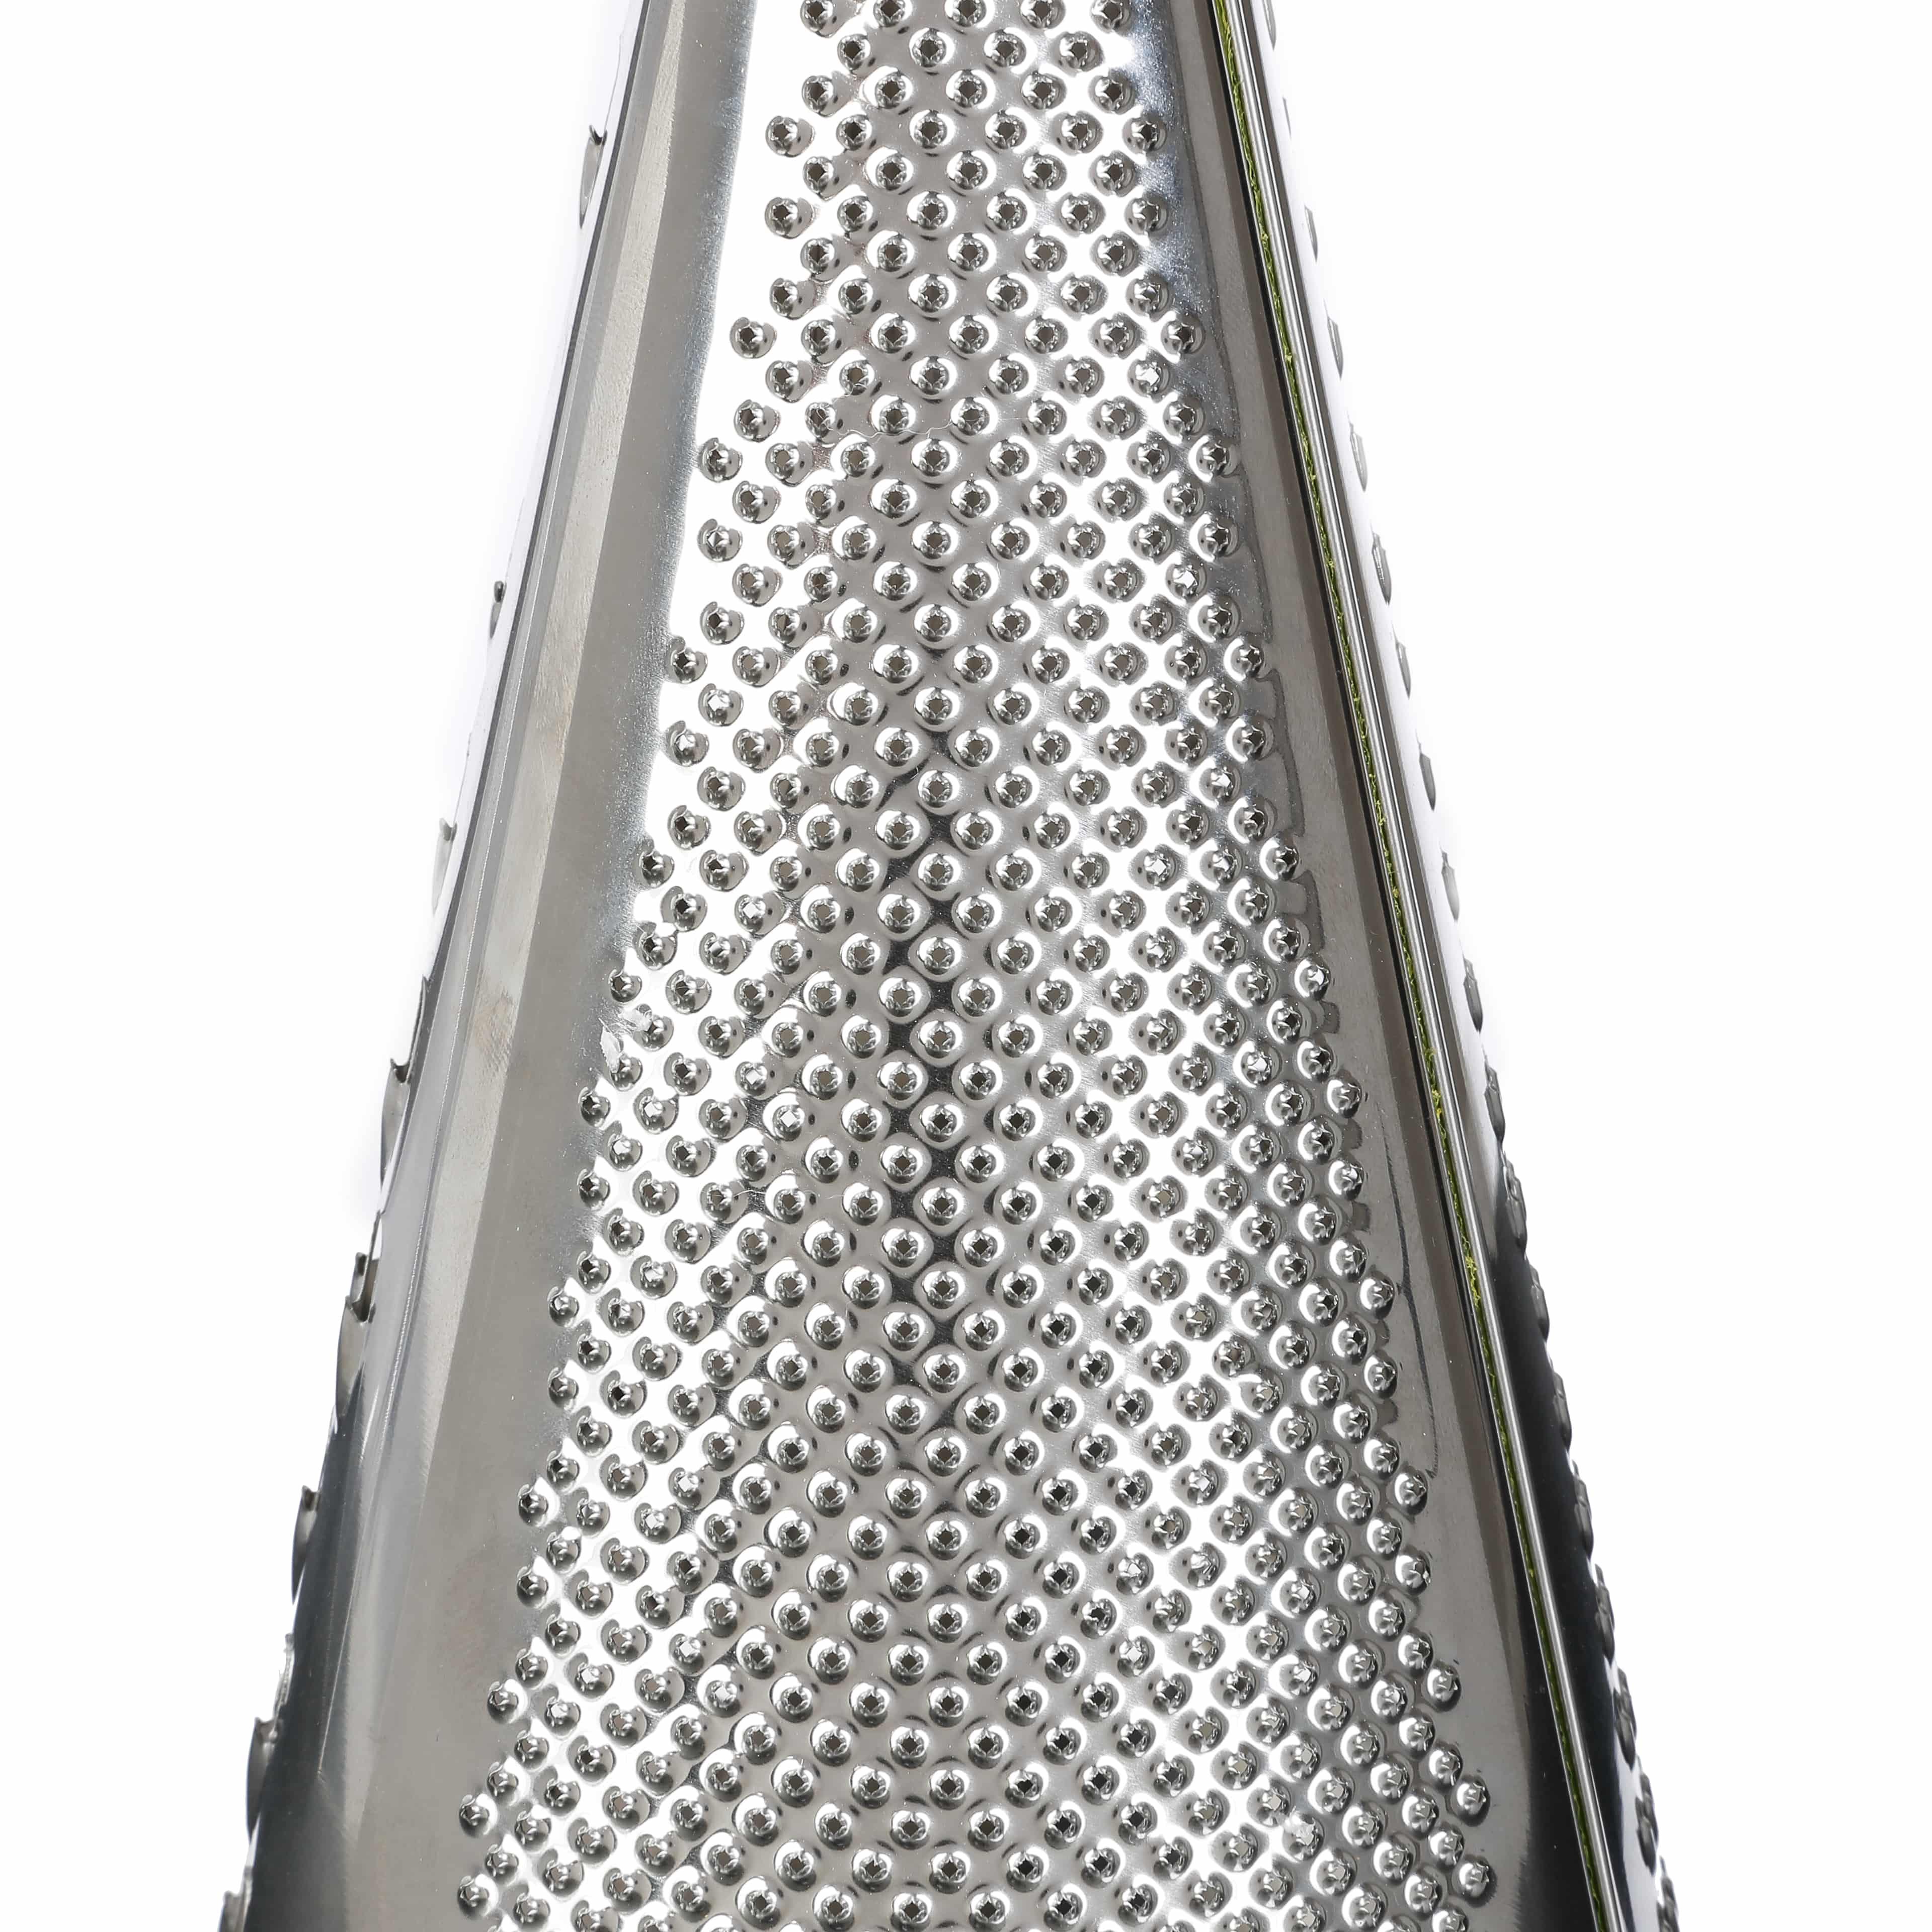 4goodz Tafelrasp met 3 grofheden RVS/acacia 13x34 cm - Zilver/Bruin